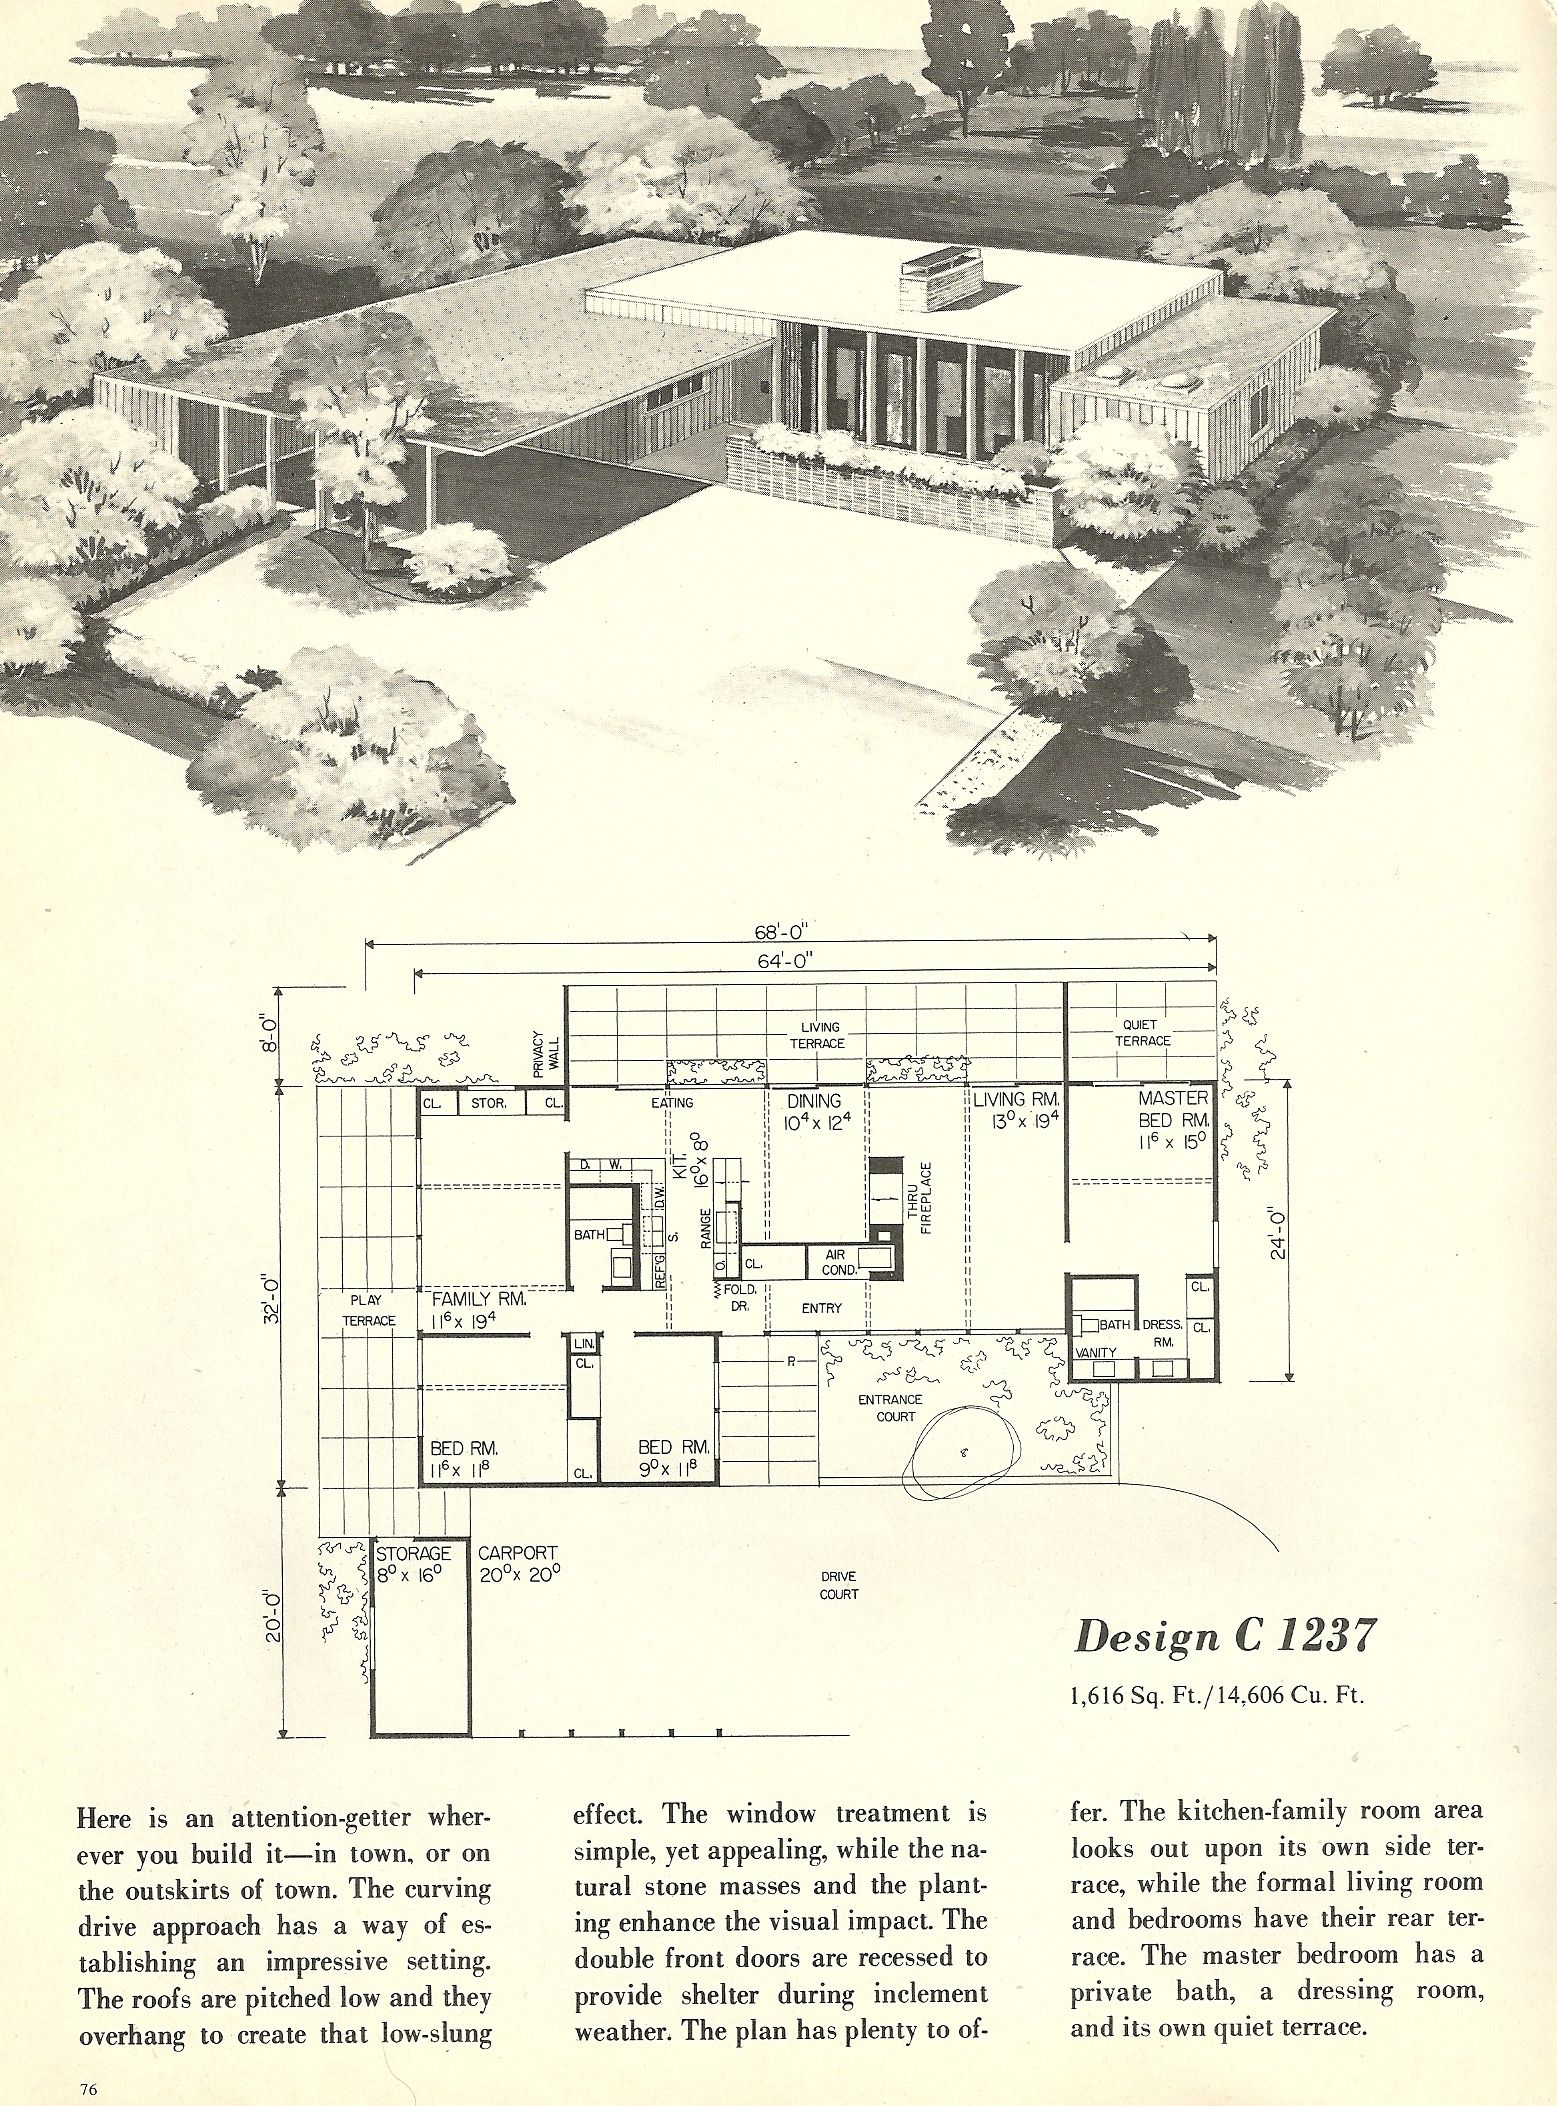 Vintage House Plans 1237 Vintage house plans, Modern